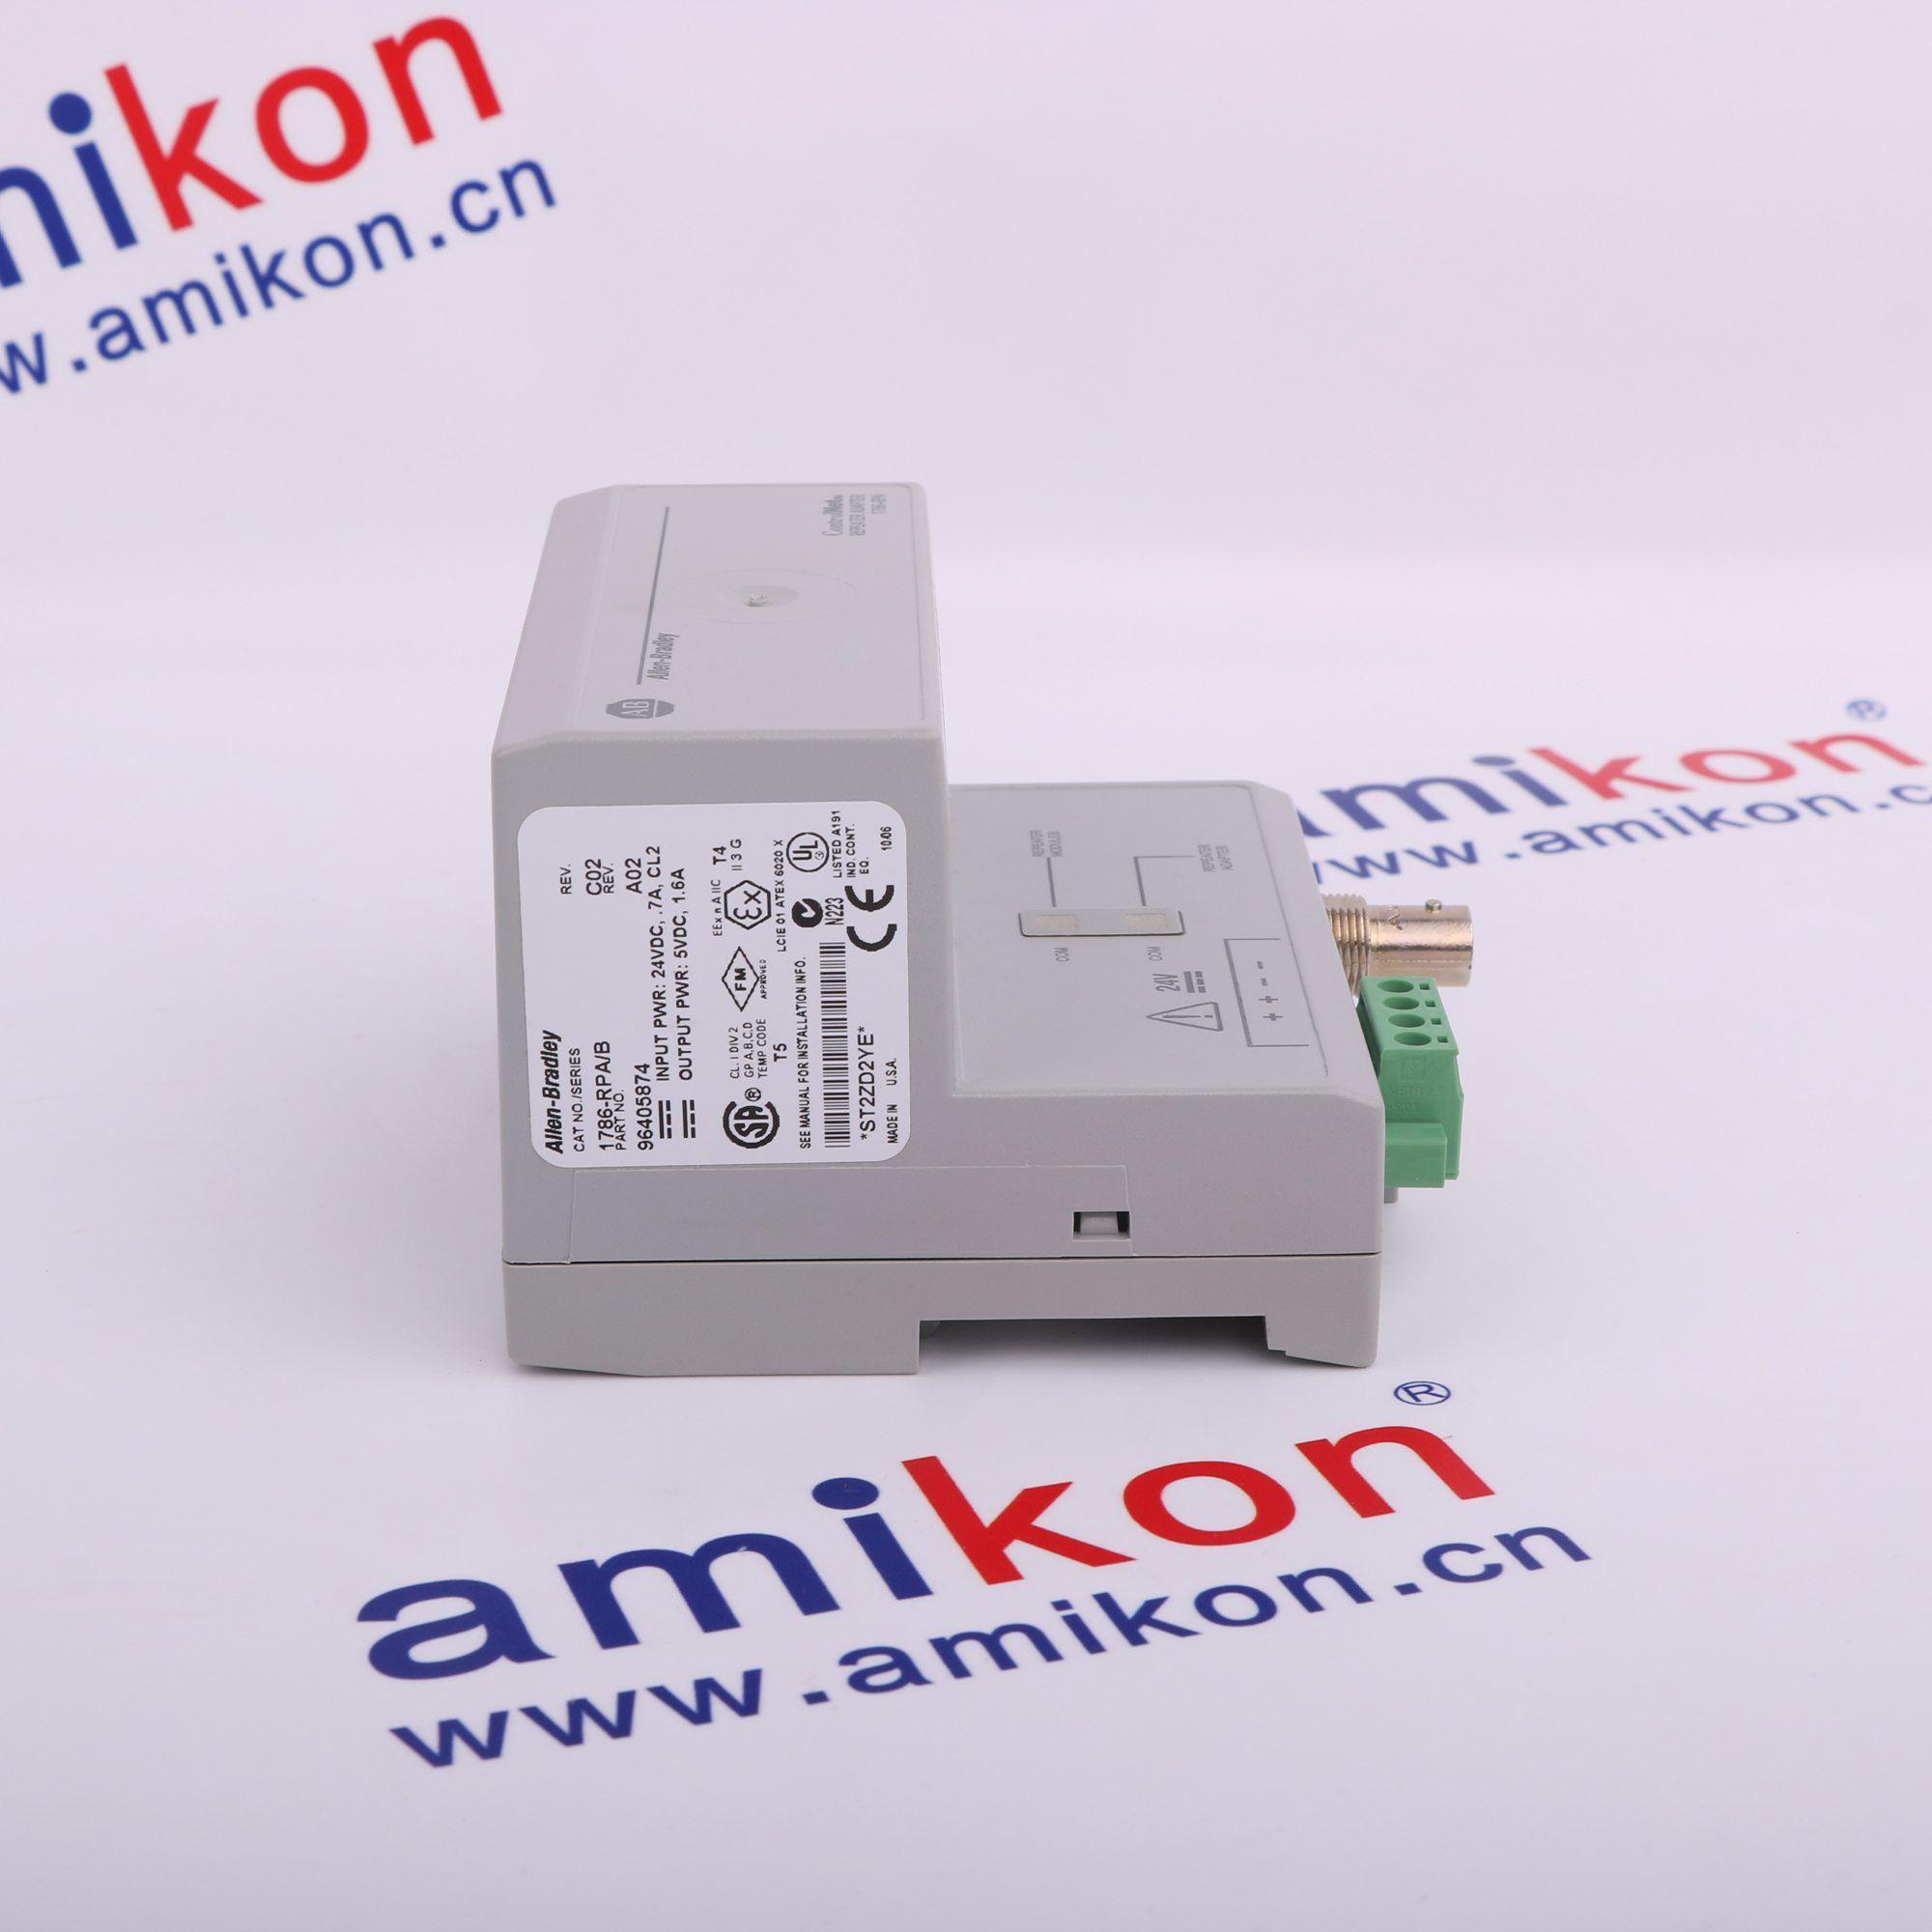 Email Sales11 Amikon Cn Skype Whatsapp 86 18030175807